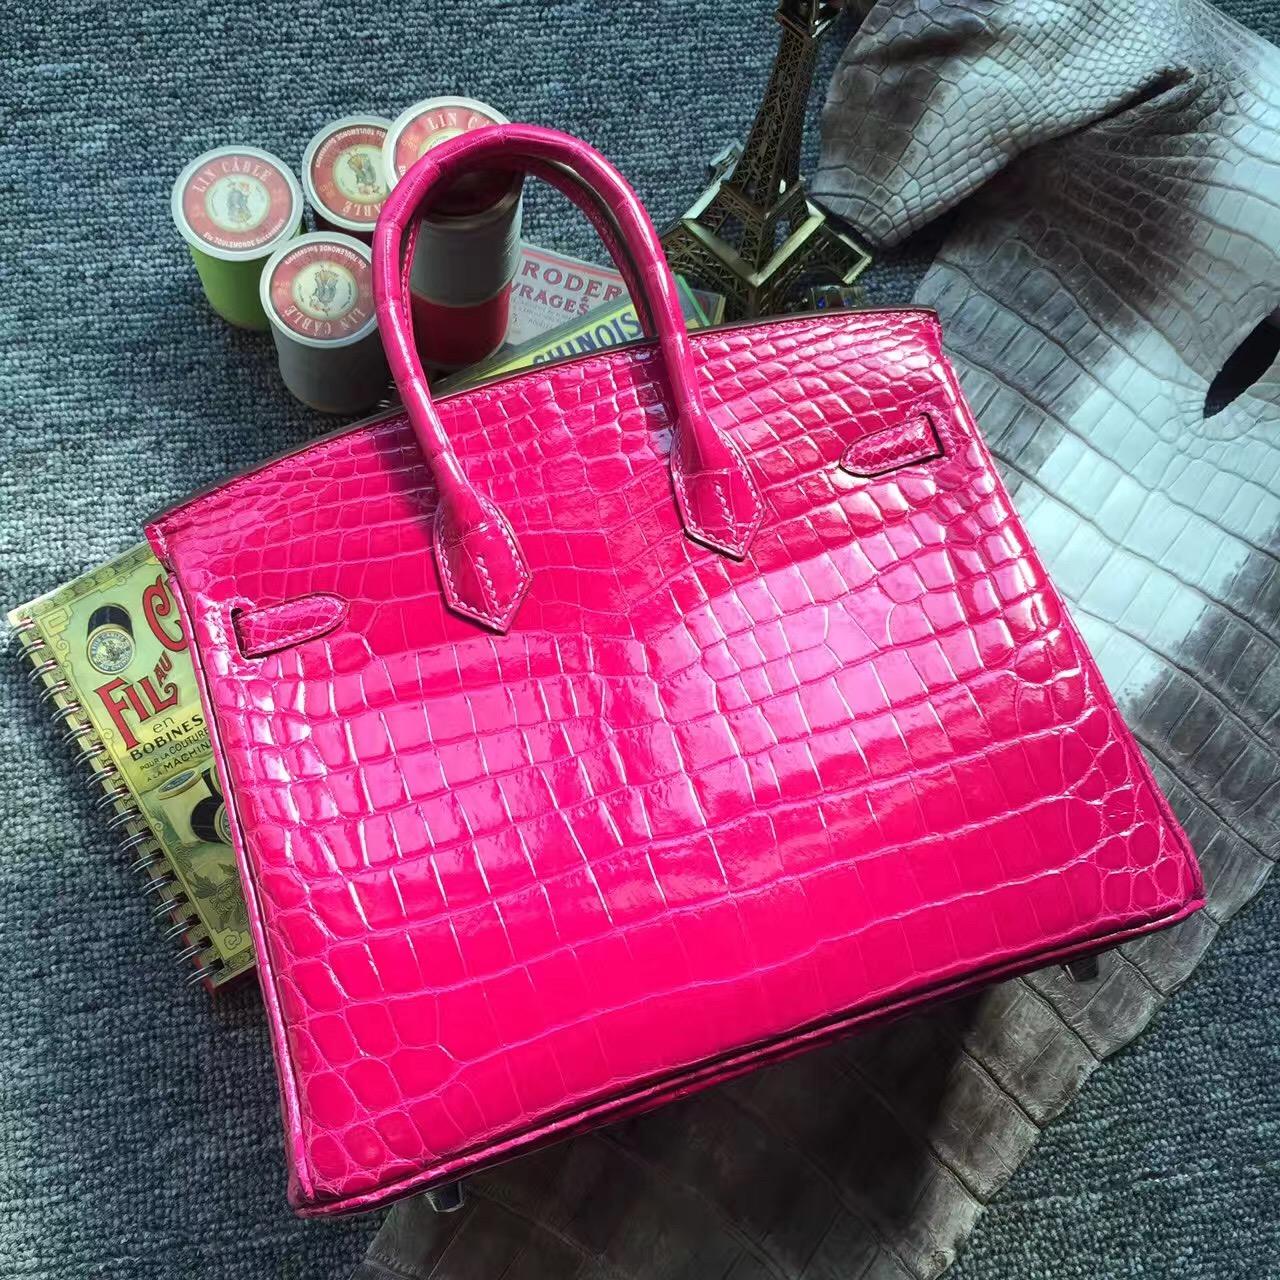 New Pretty Hermes J5 Rose Scheherazade Crocodile Shiny Leather Birkin25cm Bag